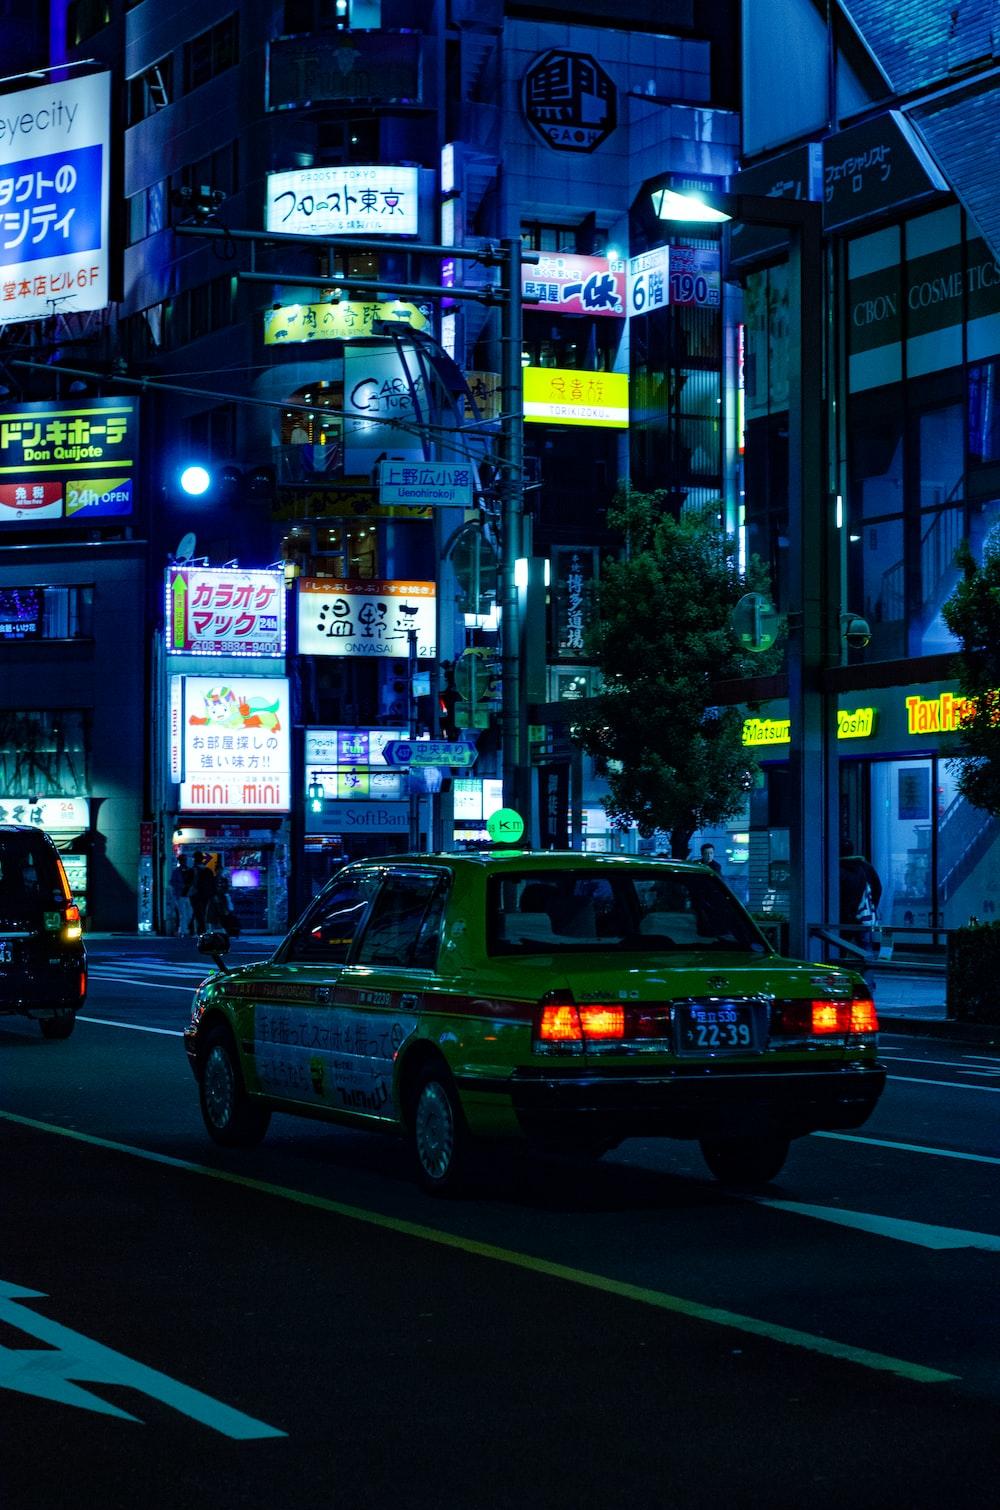 yellow sedan during nighttime